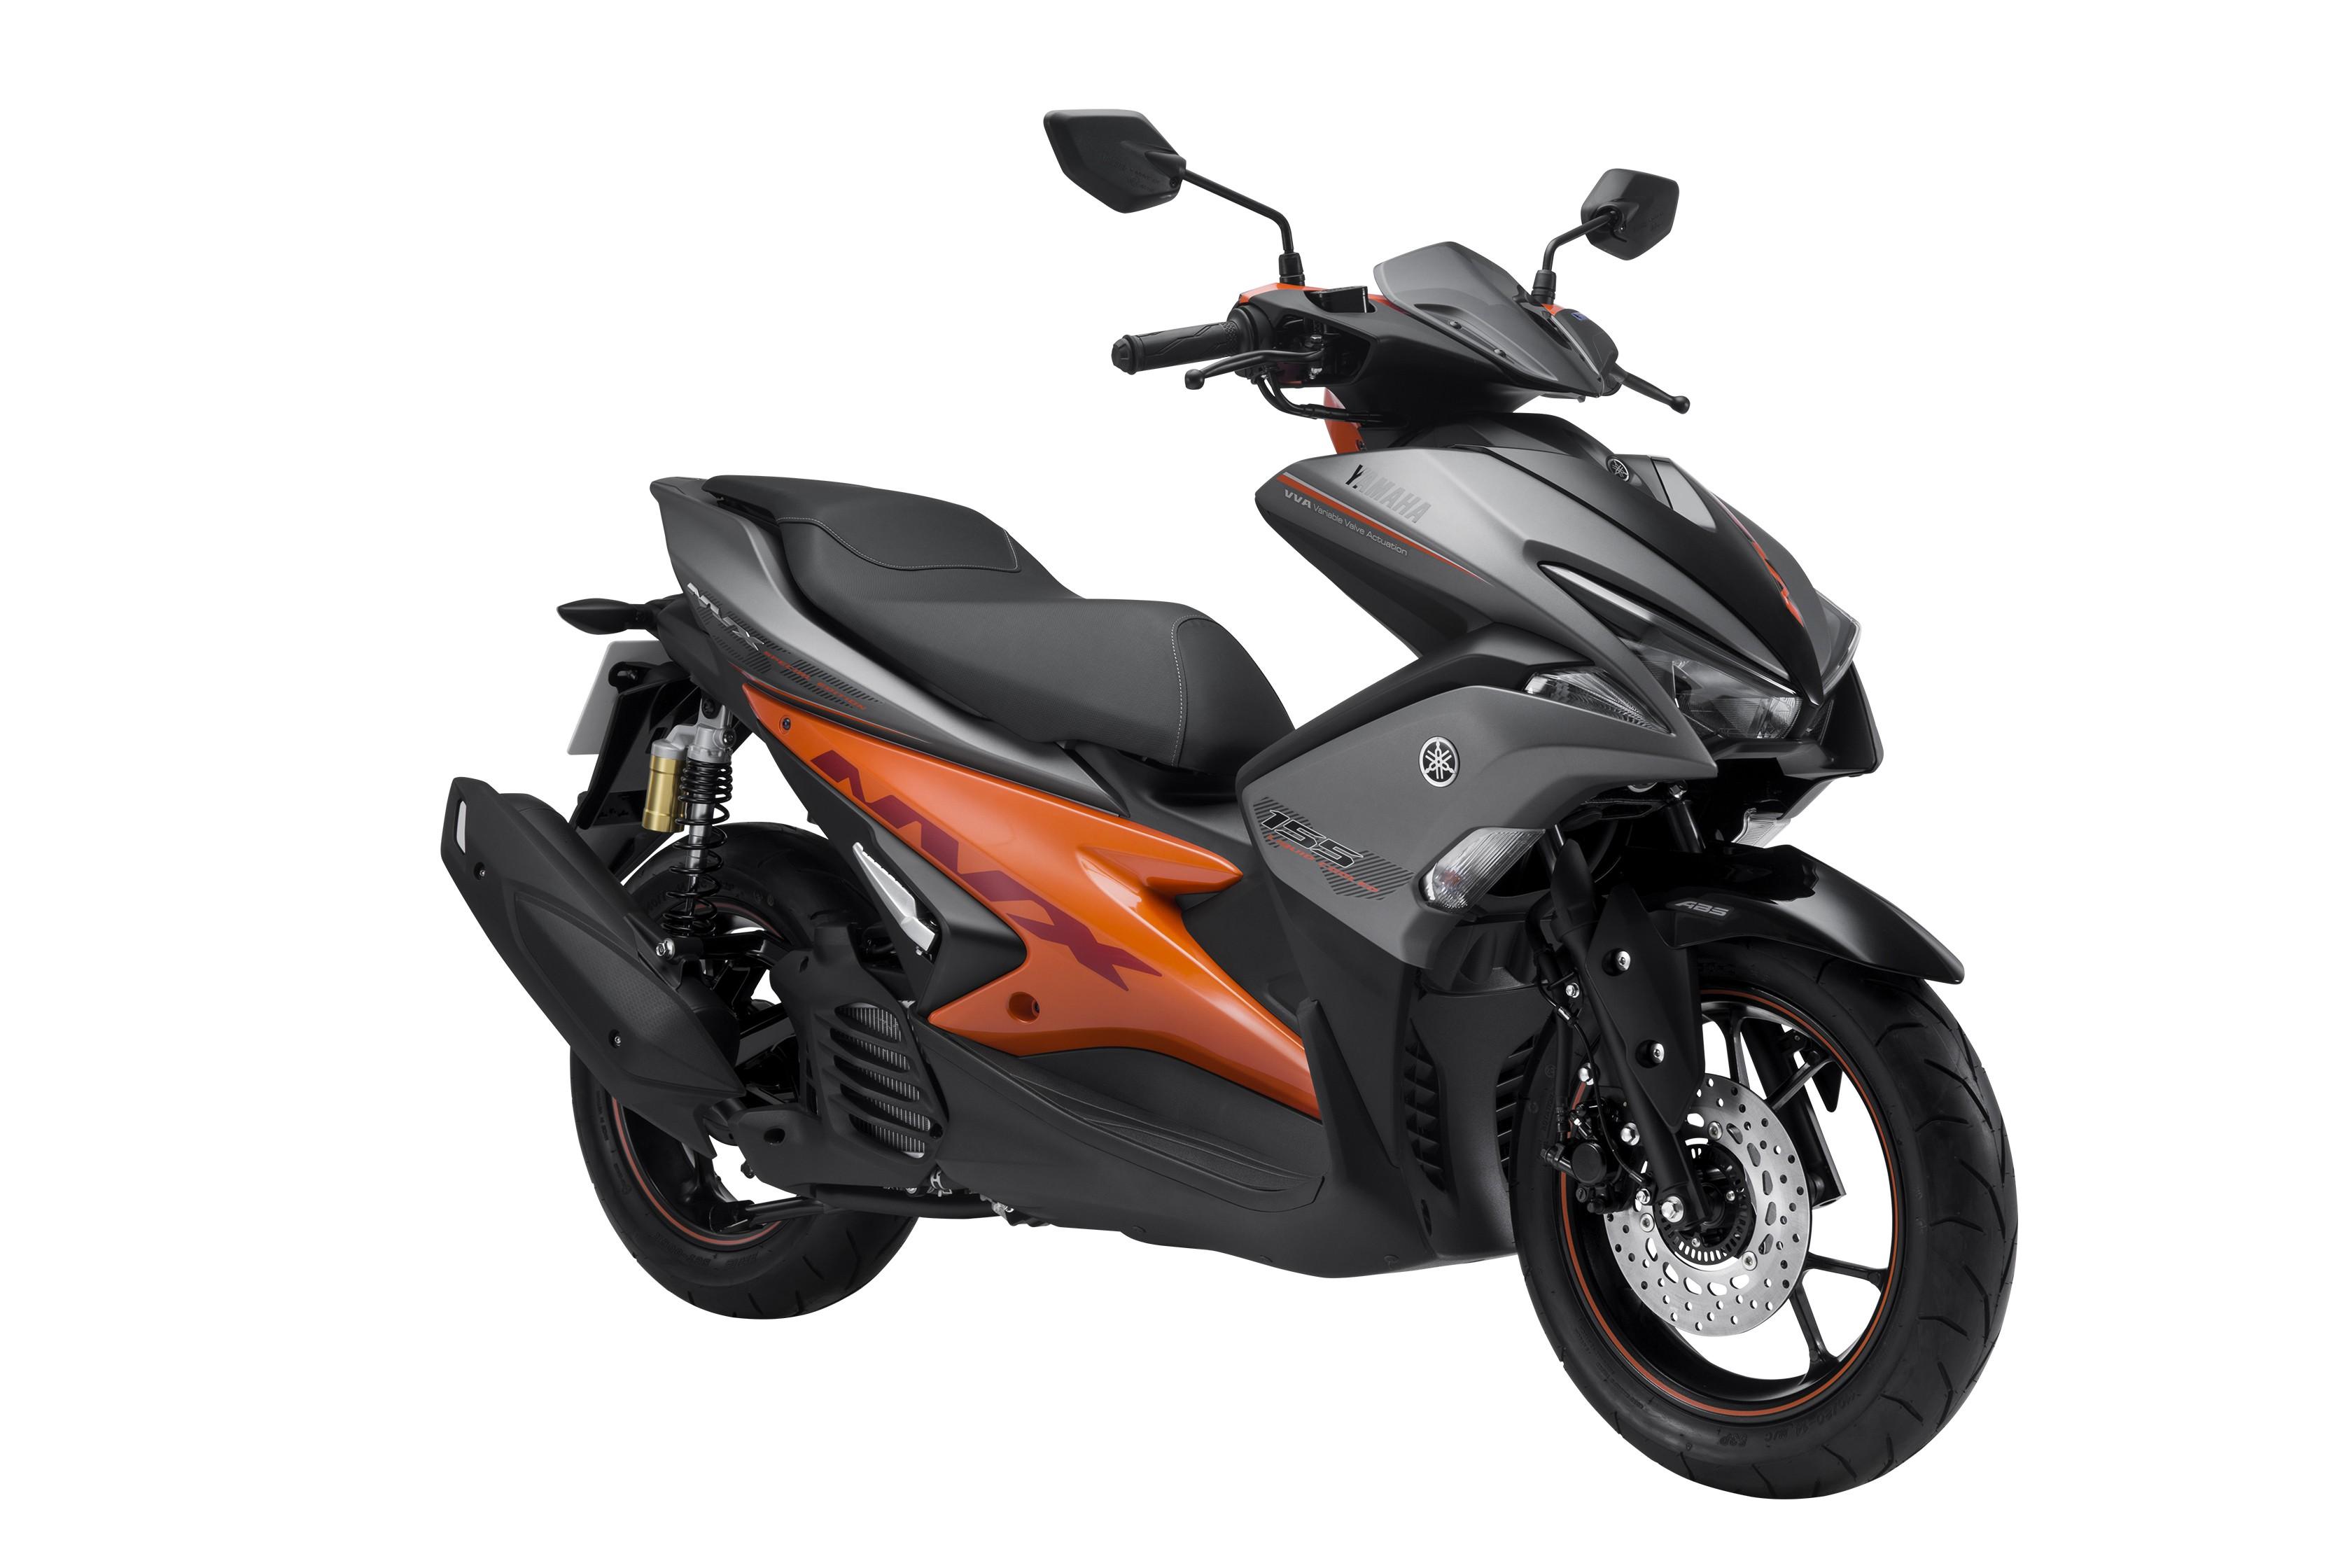 Yamaha NVX 155 ABS màu Xám Cam Đen